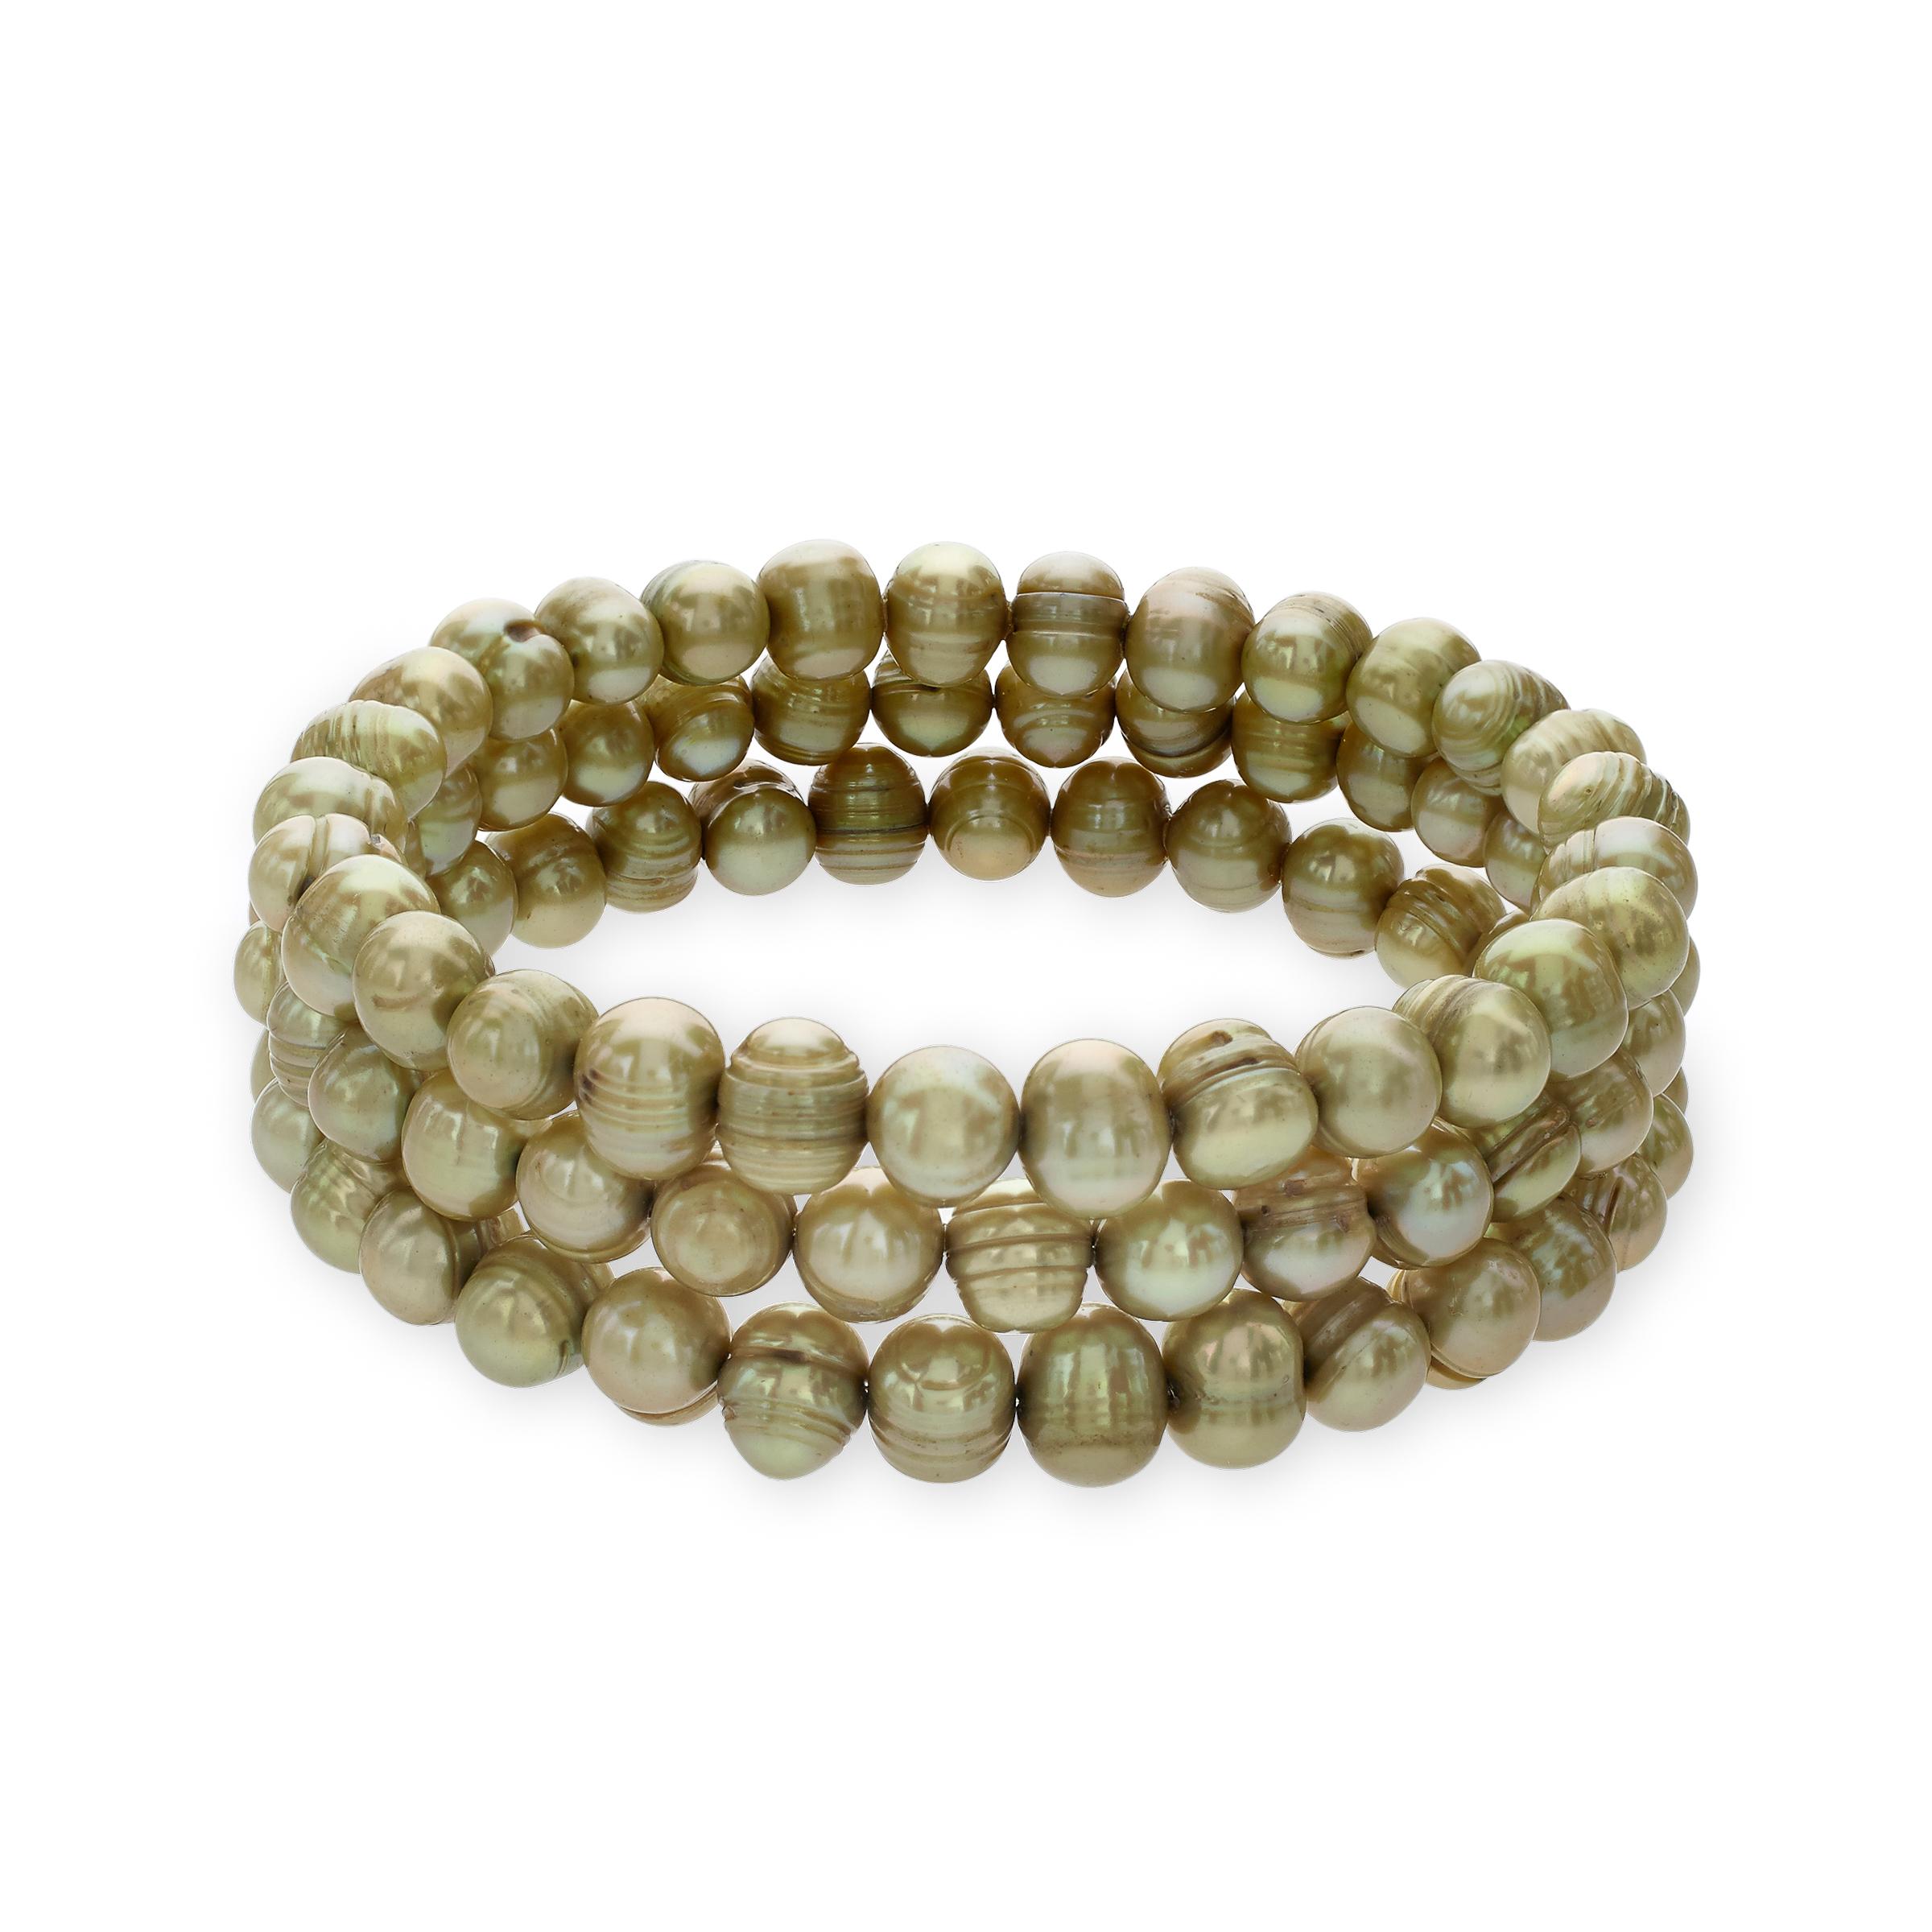 Honora Set of 3 Ringed 7-8mm Pistachio Freshwater Cultured Pearl Bangle Bead Bracelets